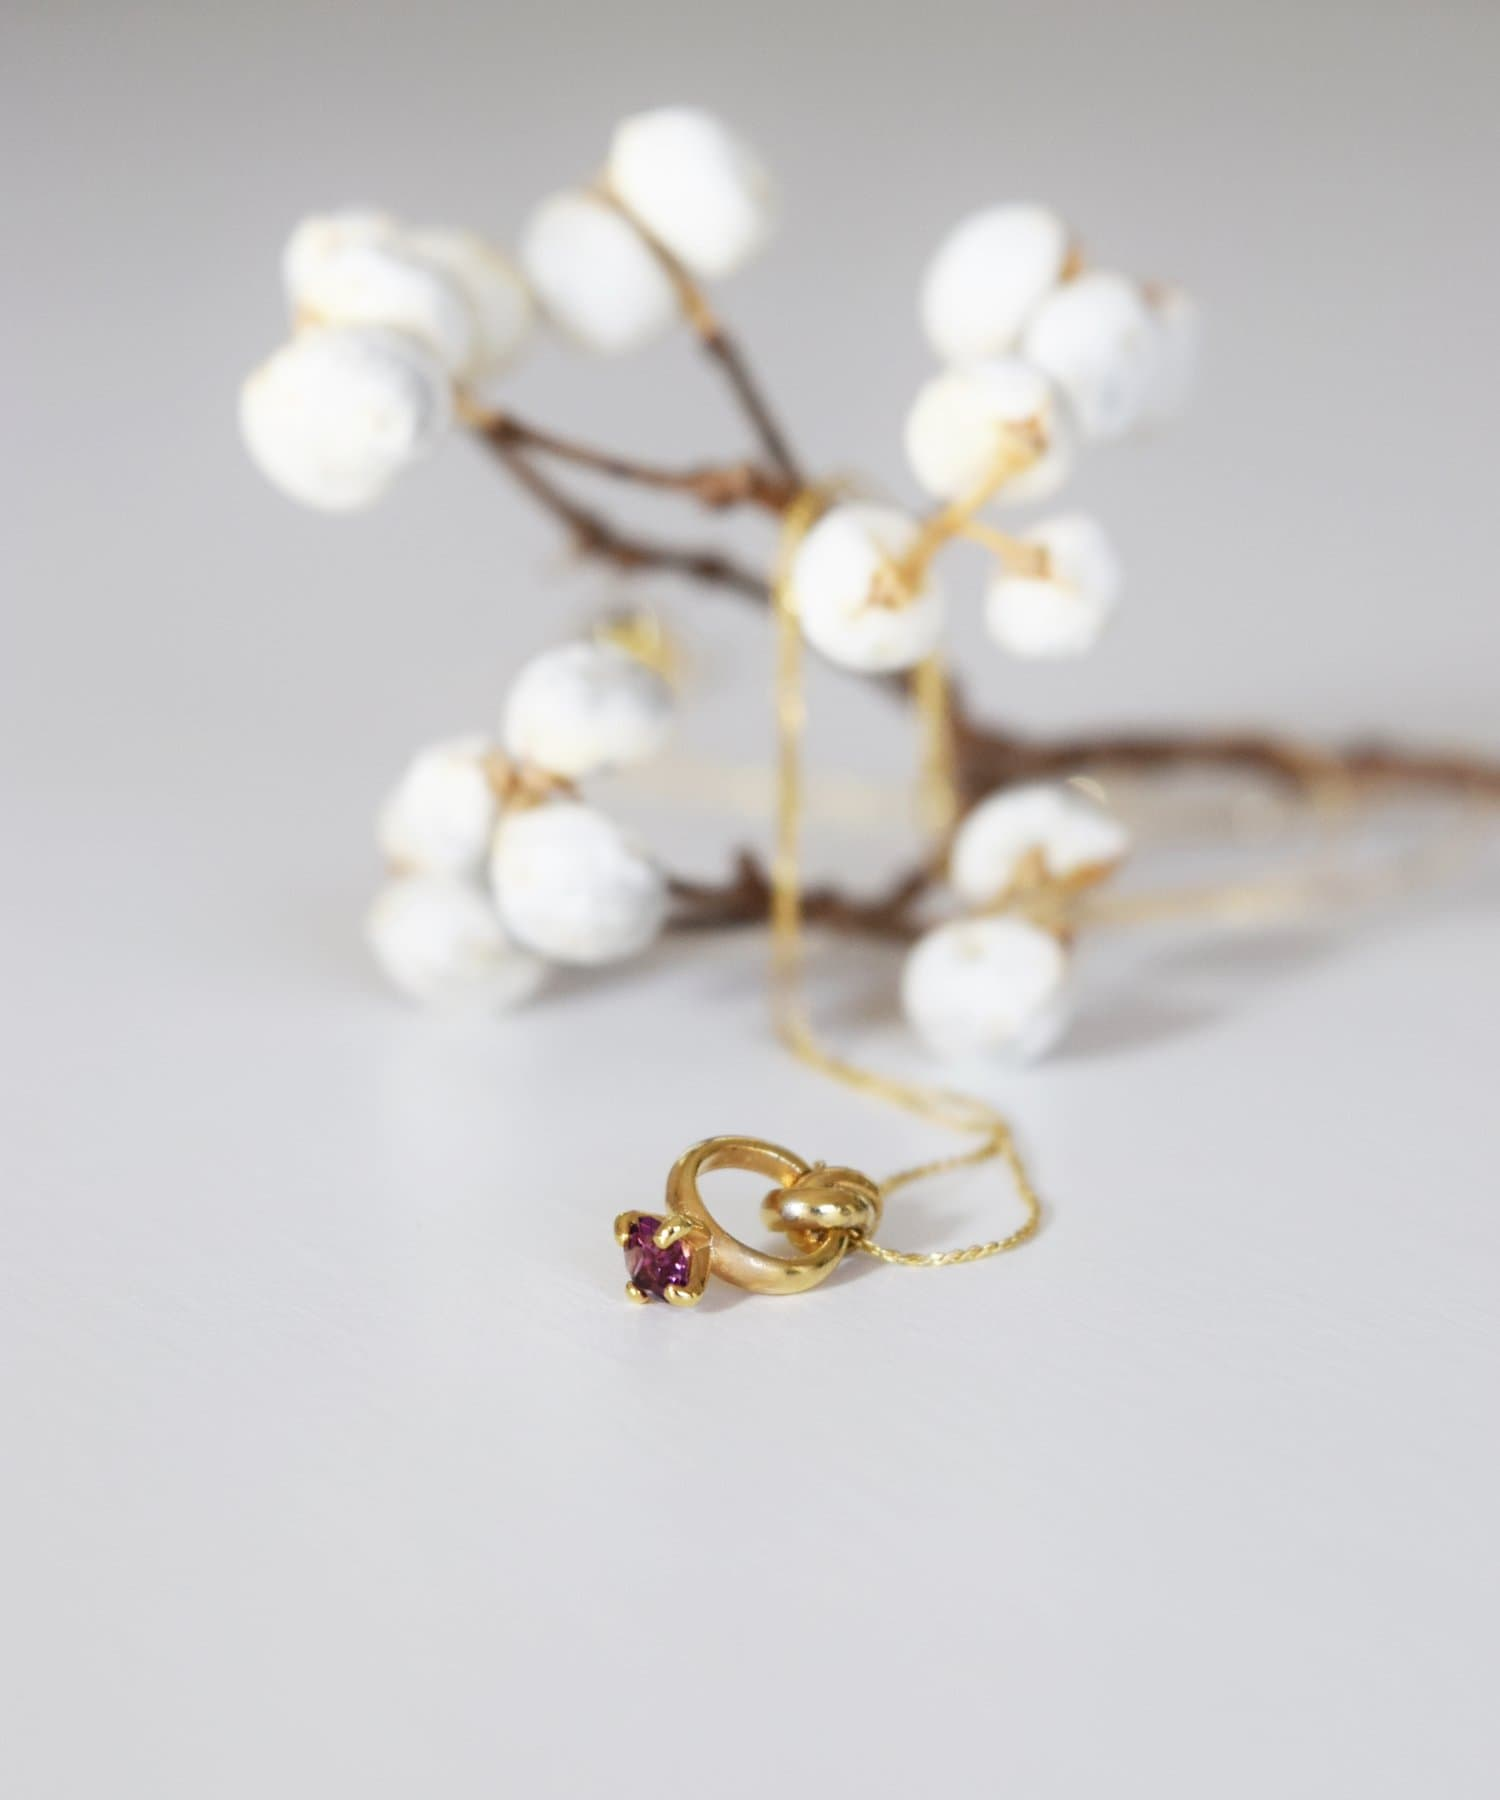 BIRTHDAY BAR(バースデイバー) レディース Birthstone Petit Ring Necklace 誕生石ネックレス パープル